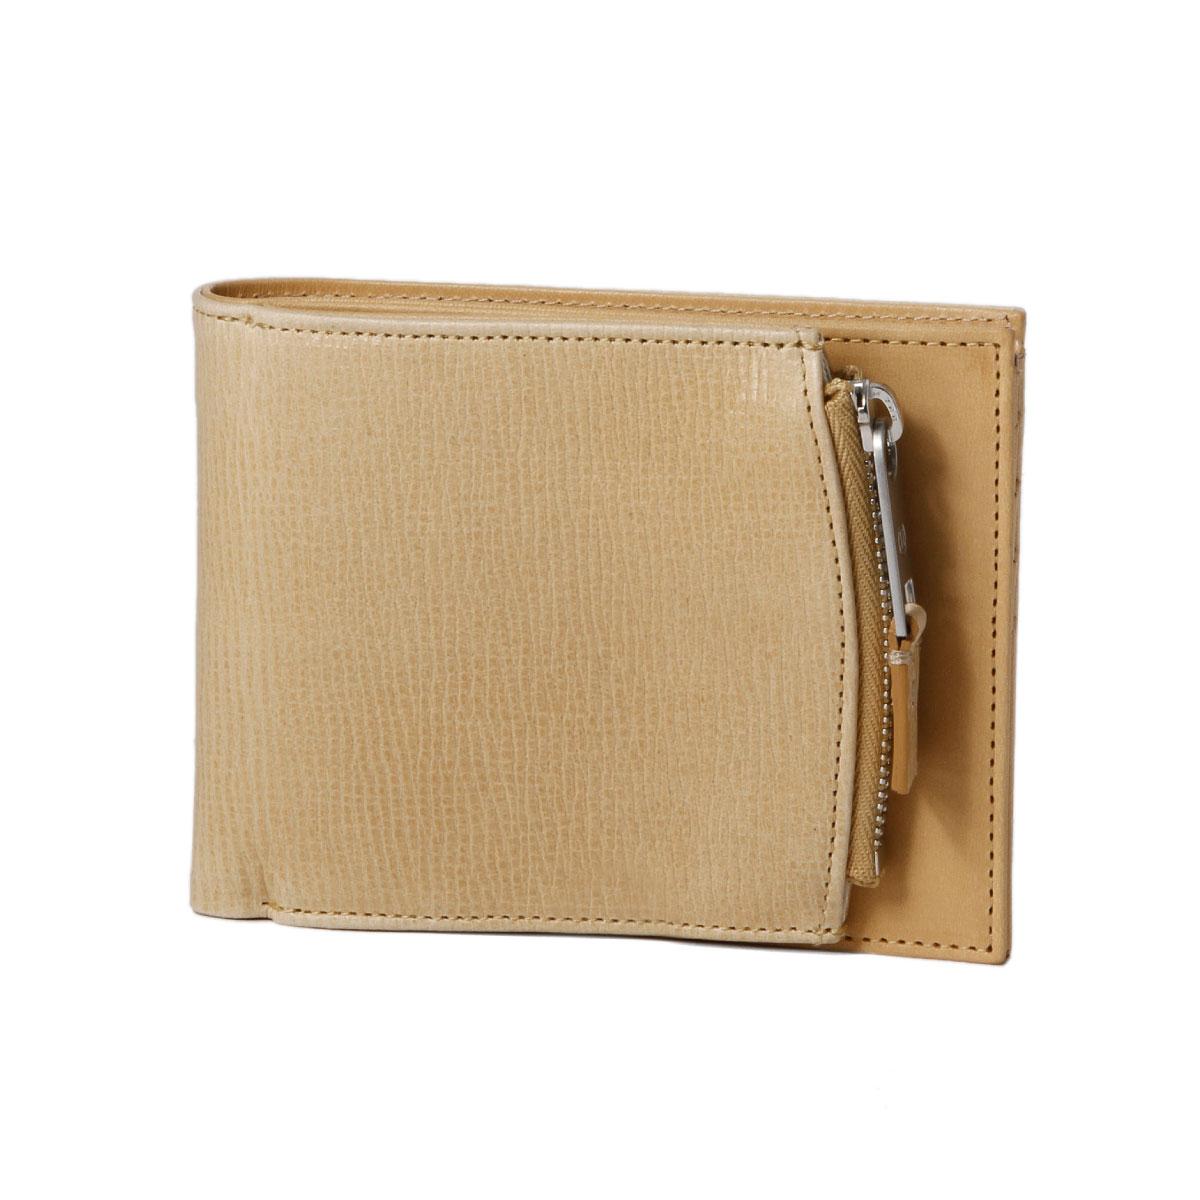 db7b6c43 メゾンマルジェラ MAISON MARGIELA wallet men S35UI0436 P2392 T4091 line 11 folio  wallet NUDE BEIGE beige